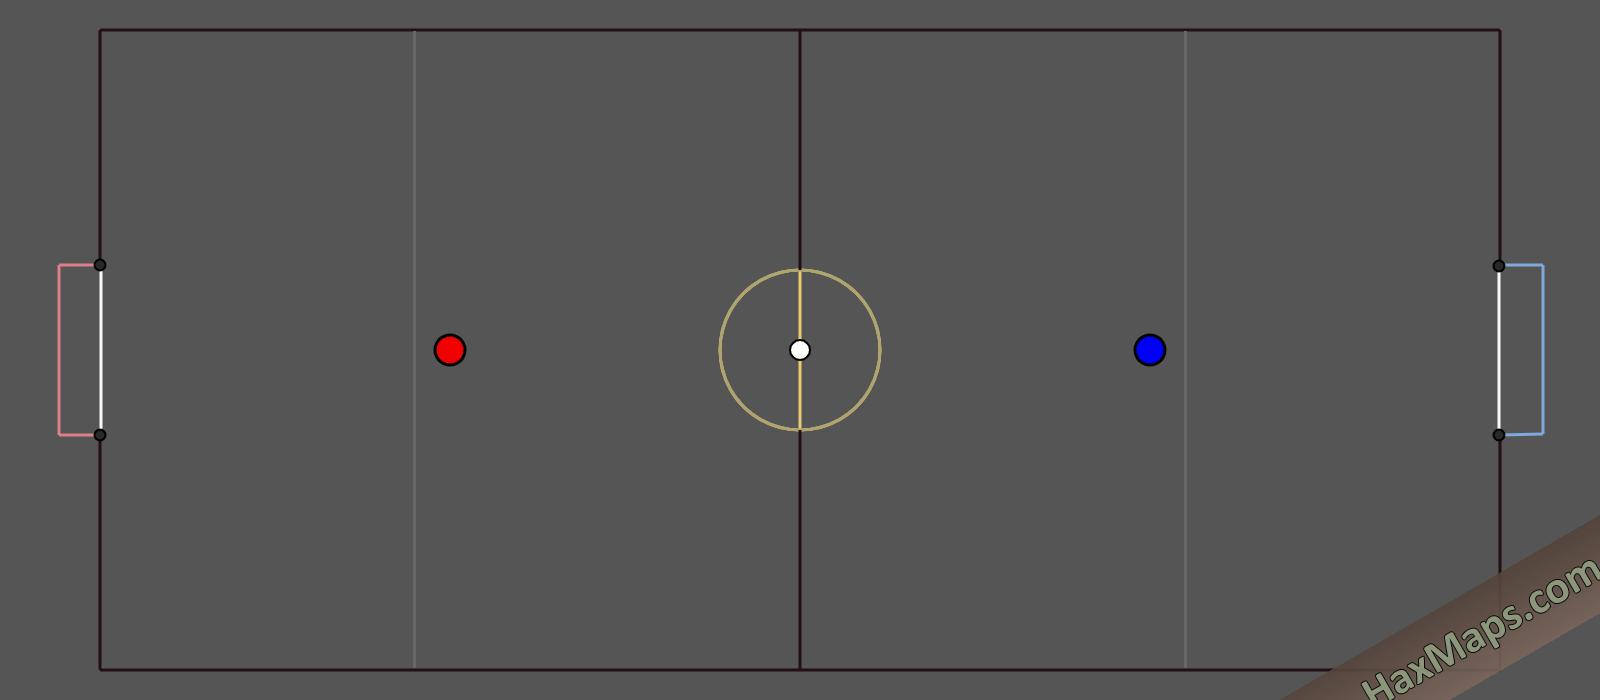 hax ball maps | EFC Futsal v3 v4 with def lines